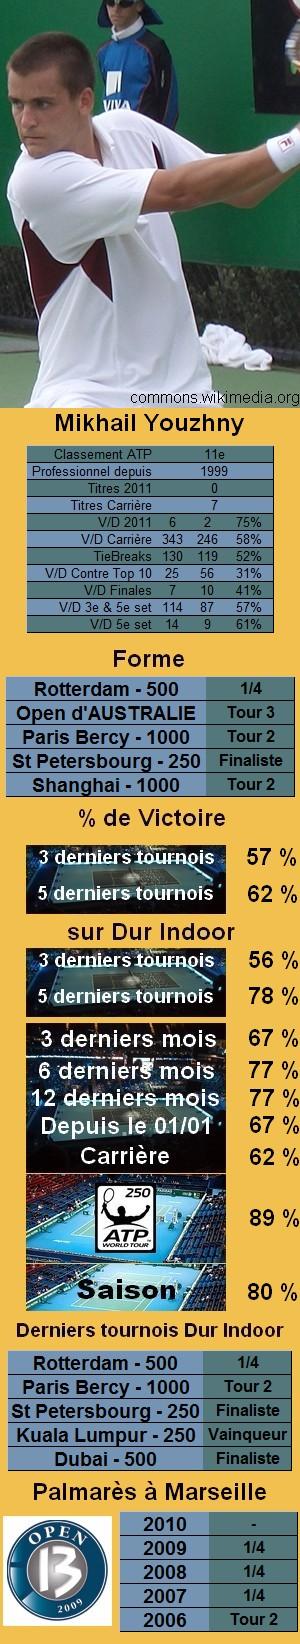 Statistiques tennis Mikhail Youzhny